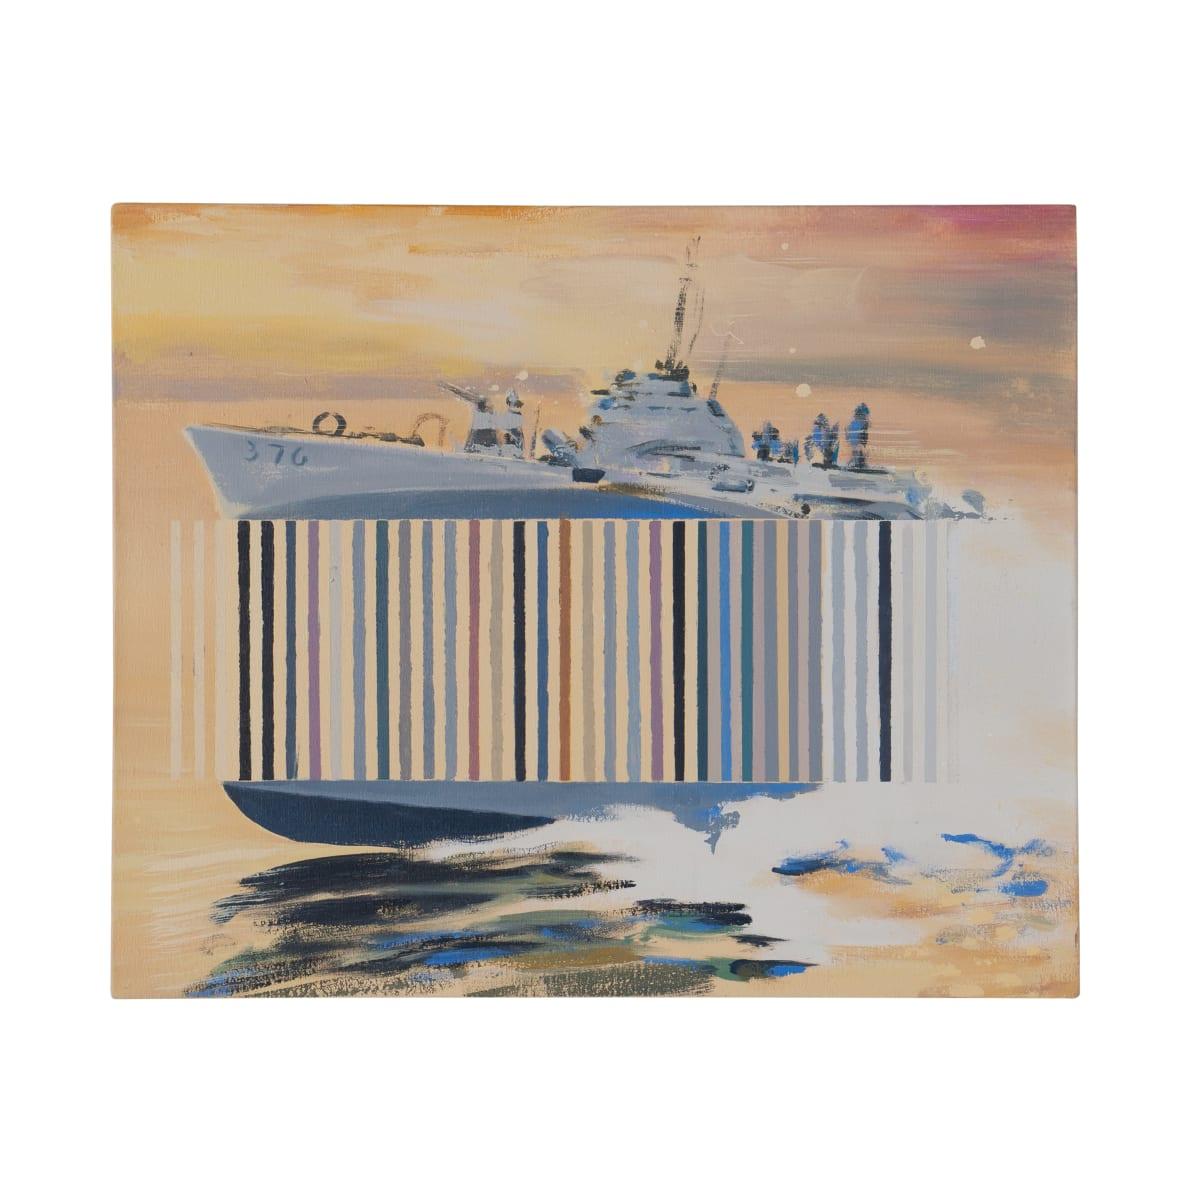 Darren Coffield Spectre I, 2019 Acrylic on canvas 35.5 x 43 cm